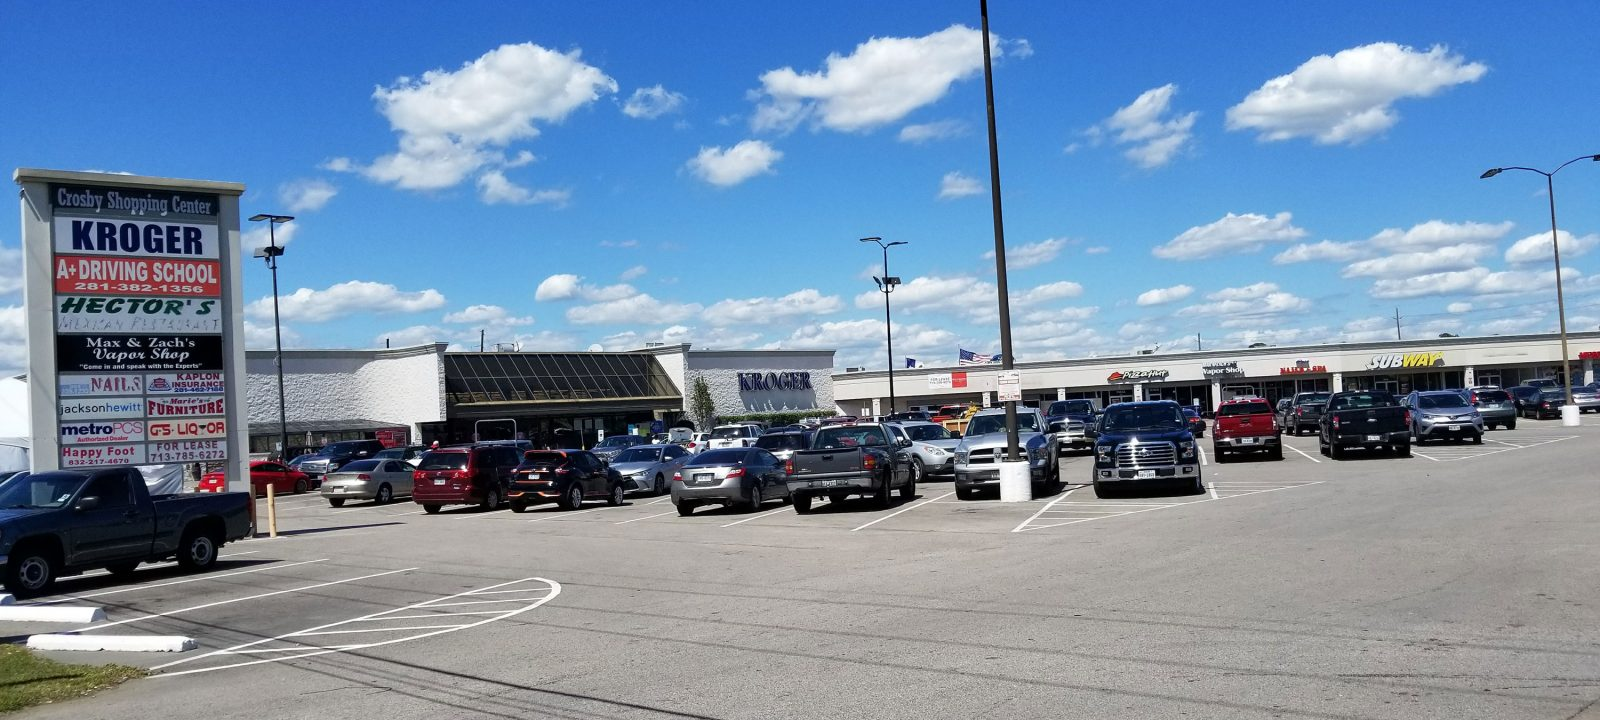 Crosby Shopping Center